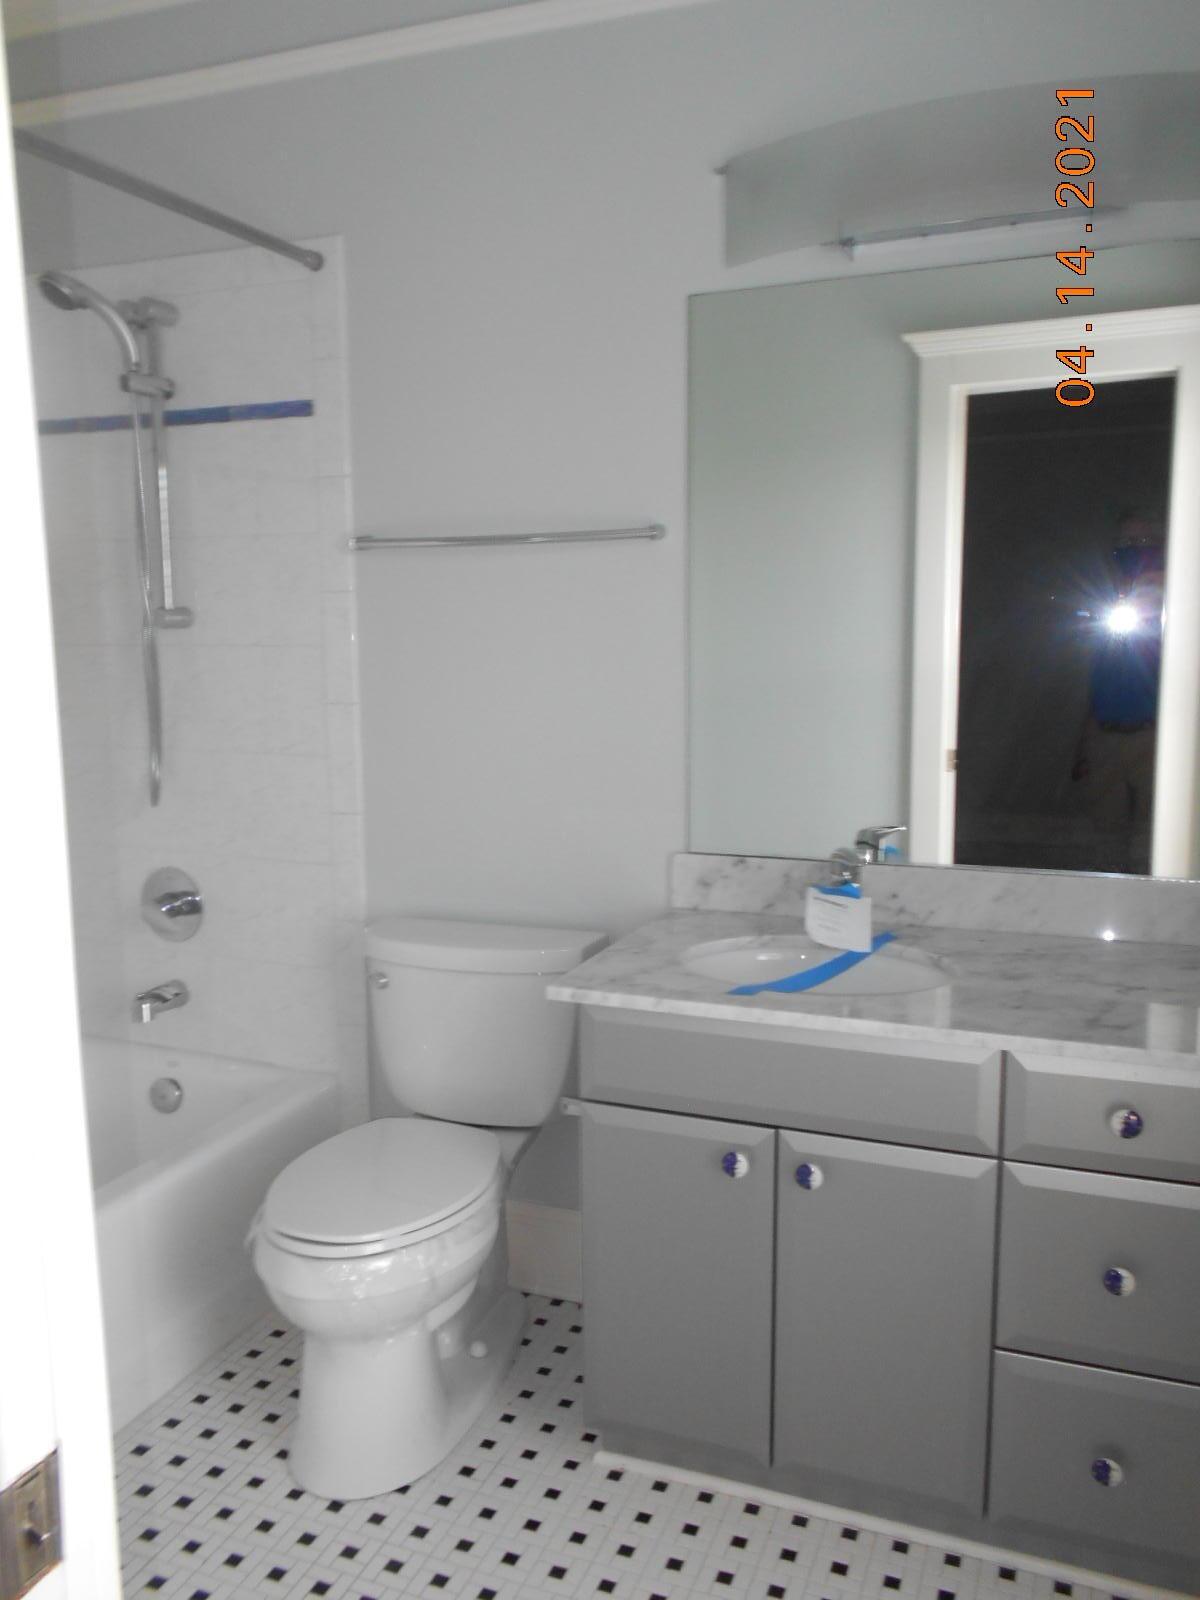 Beresford Creek Landing Homes For Sale - 1212 Winding Creek, Charleston, SC - 24